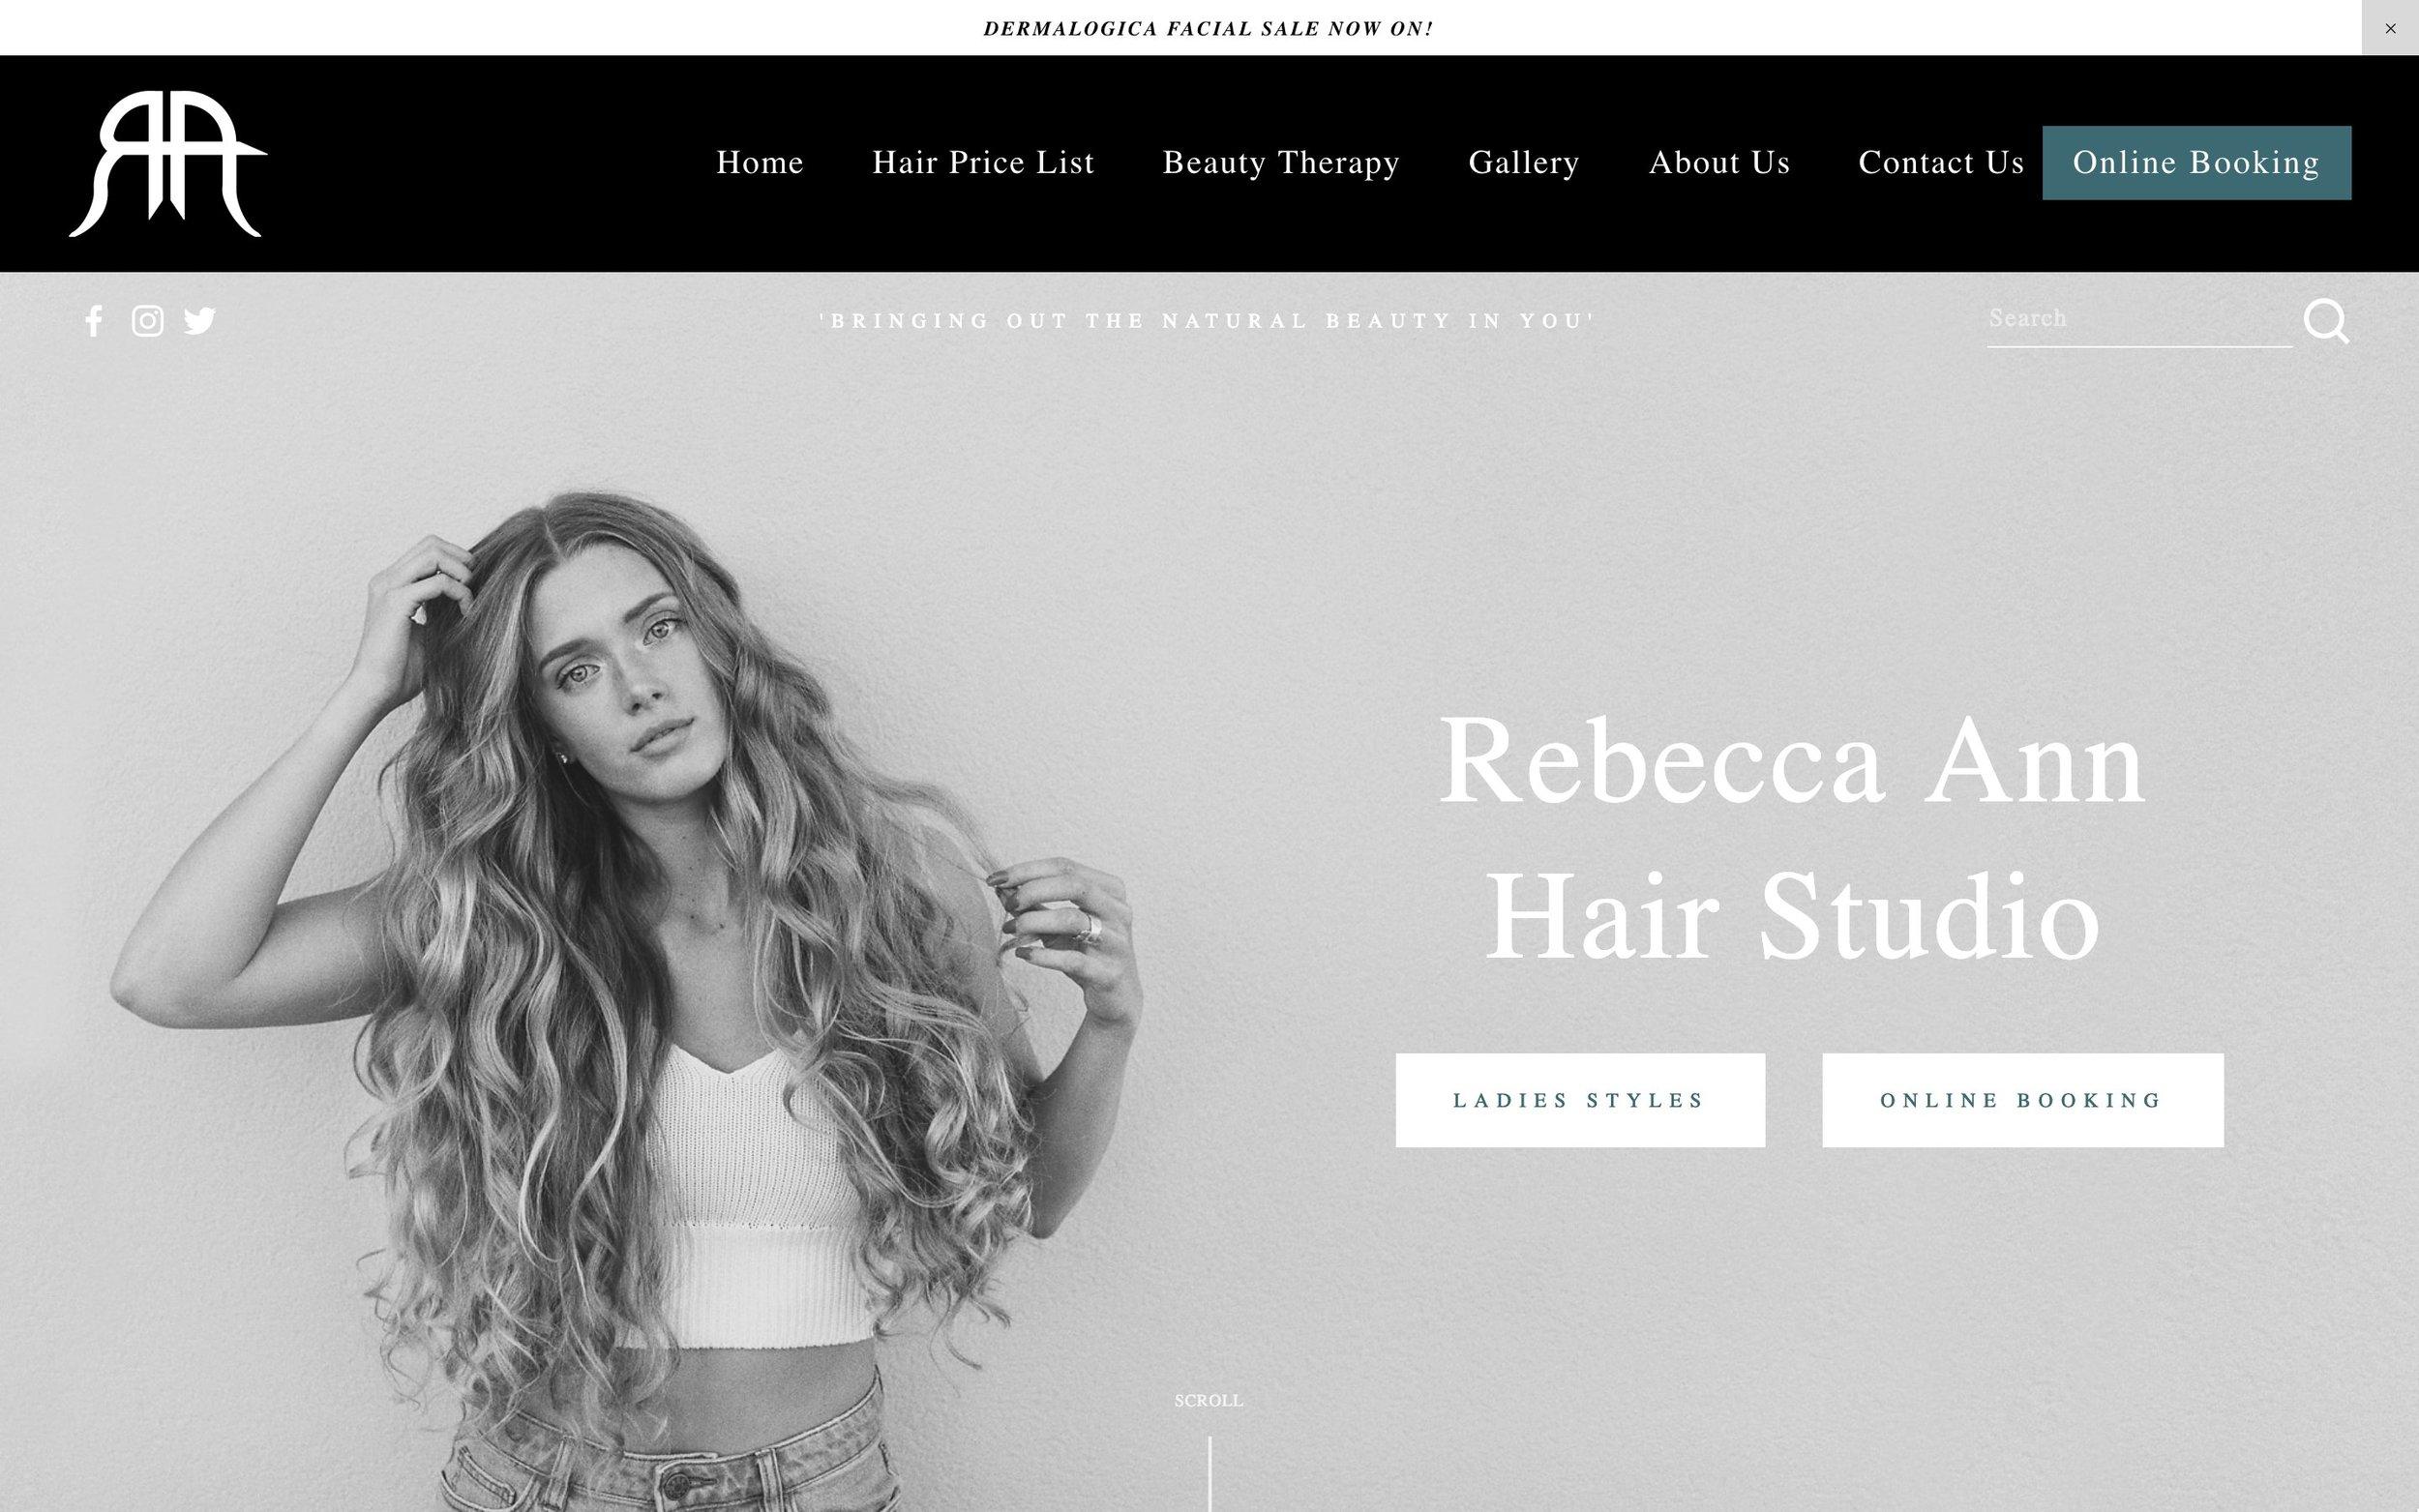 Lewis K Smith - Lewis K Smith Creative - Rebecca Ann Hair Studio.jpg